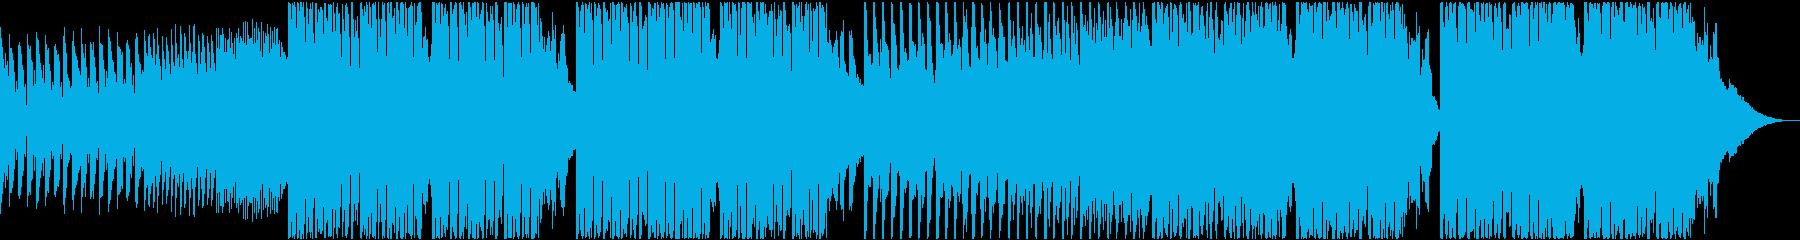 【EDM】パワー溢れるビッグフロア_01の再生済みの波形